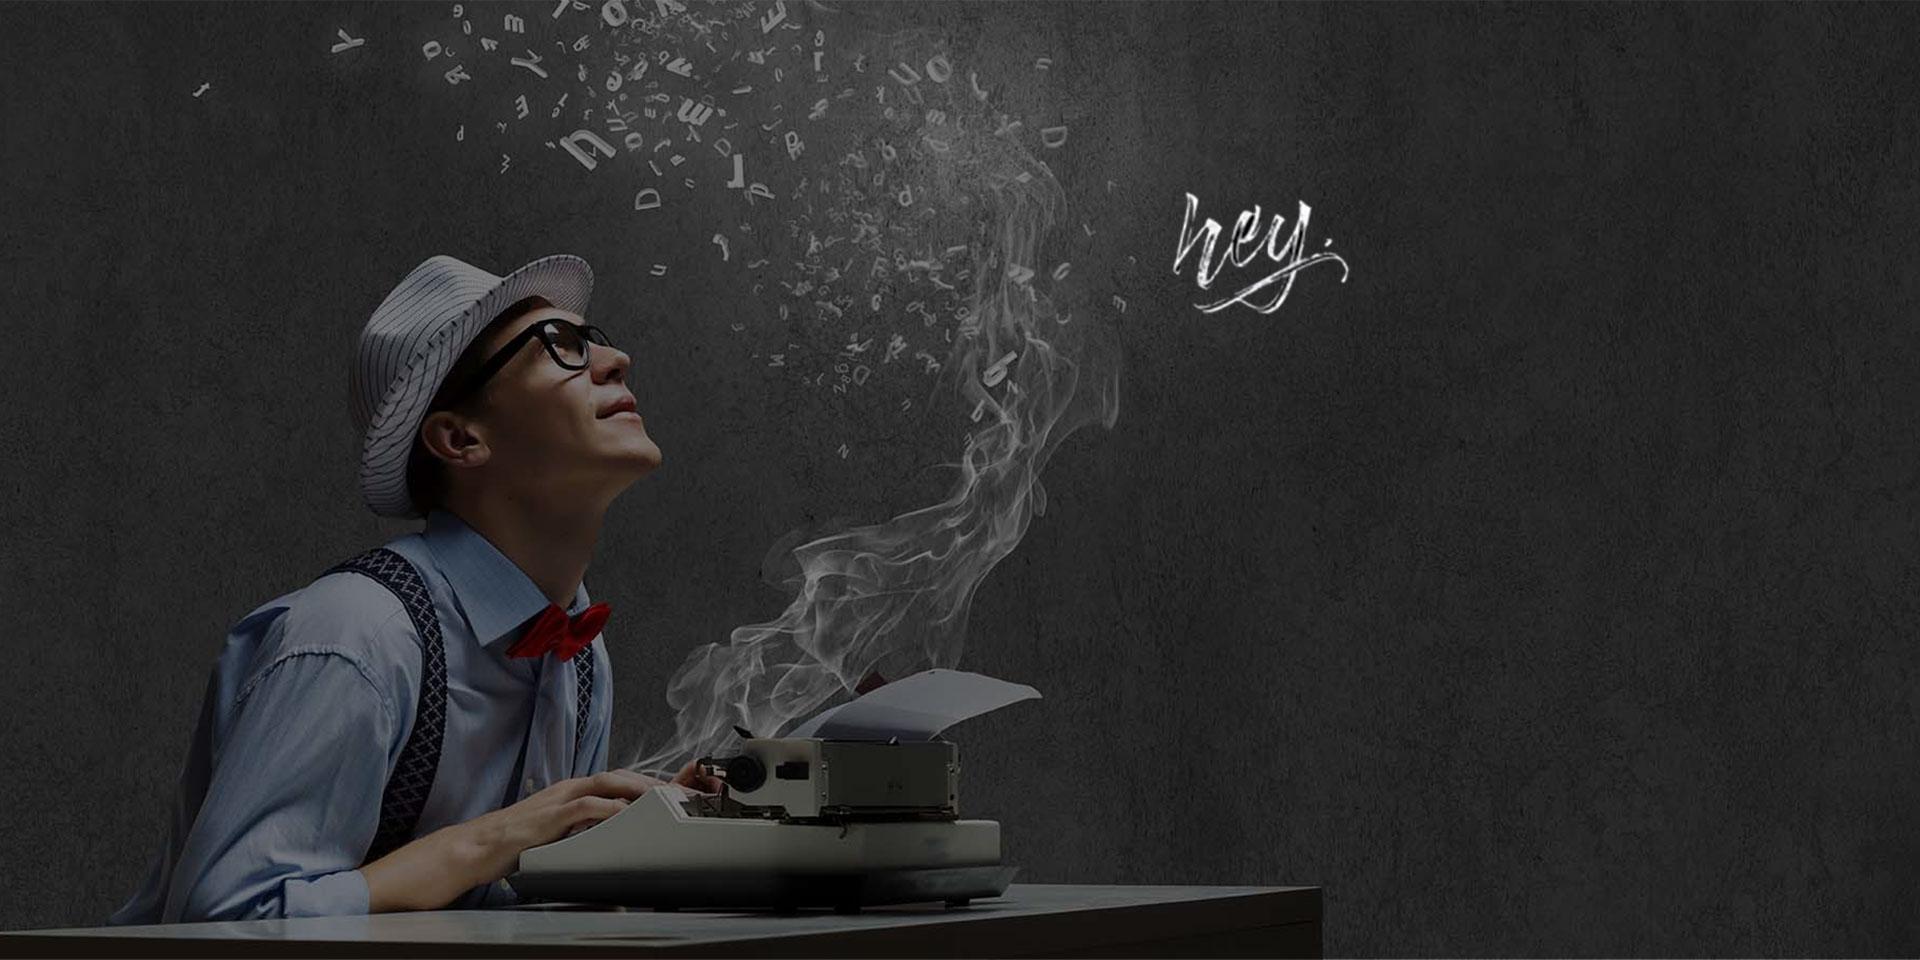 starters-united-agence-de-creation-et-developpement-franchise-et-marques-bg-slide-home